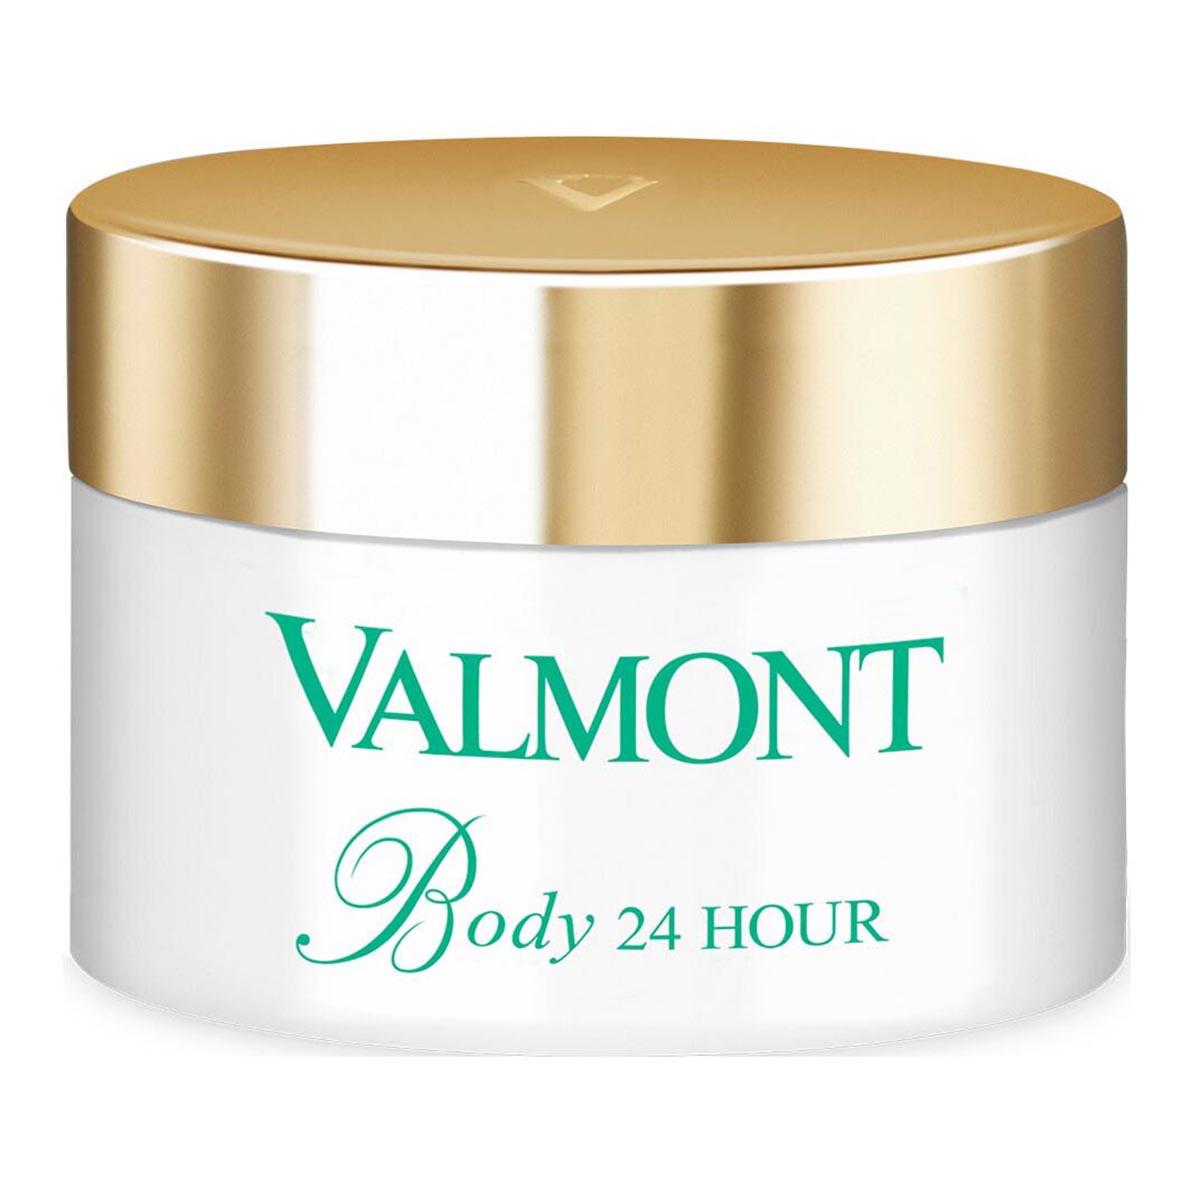 Valmont body 24 hour 200ml